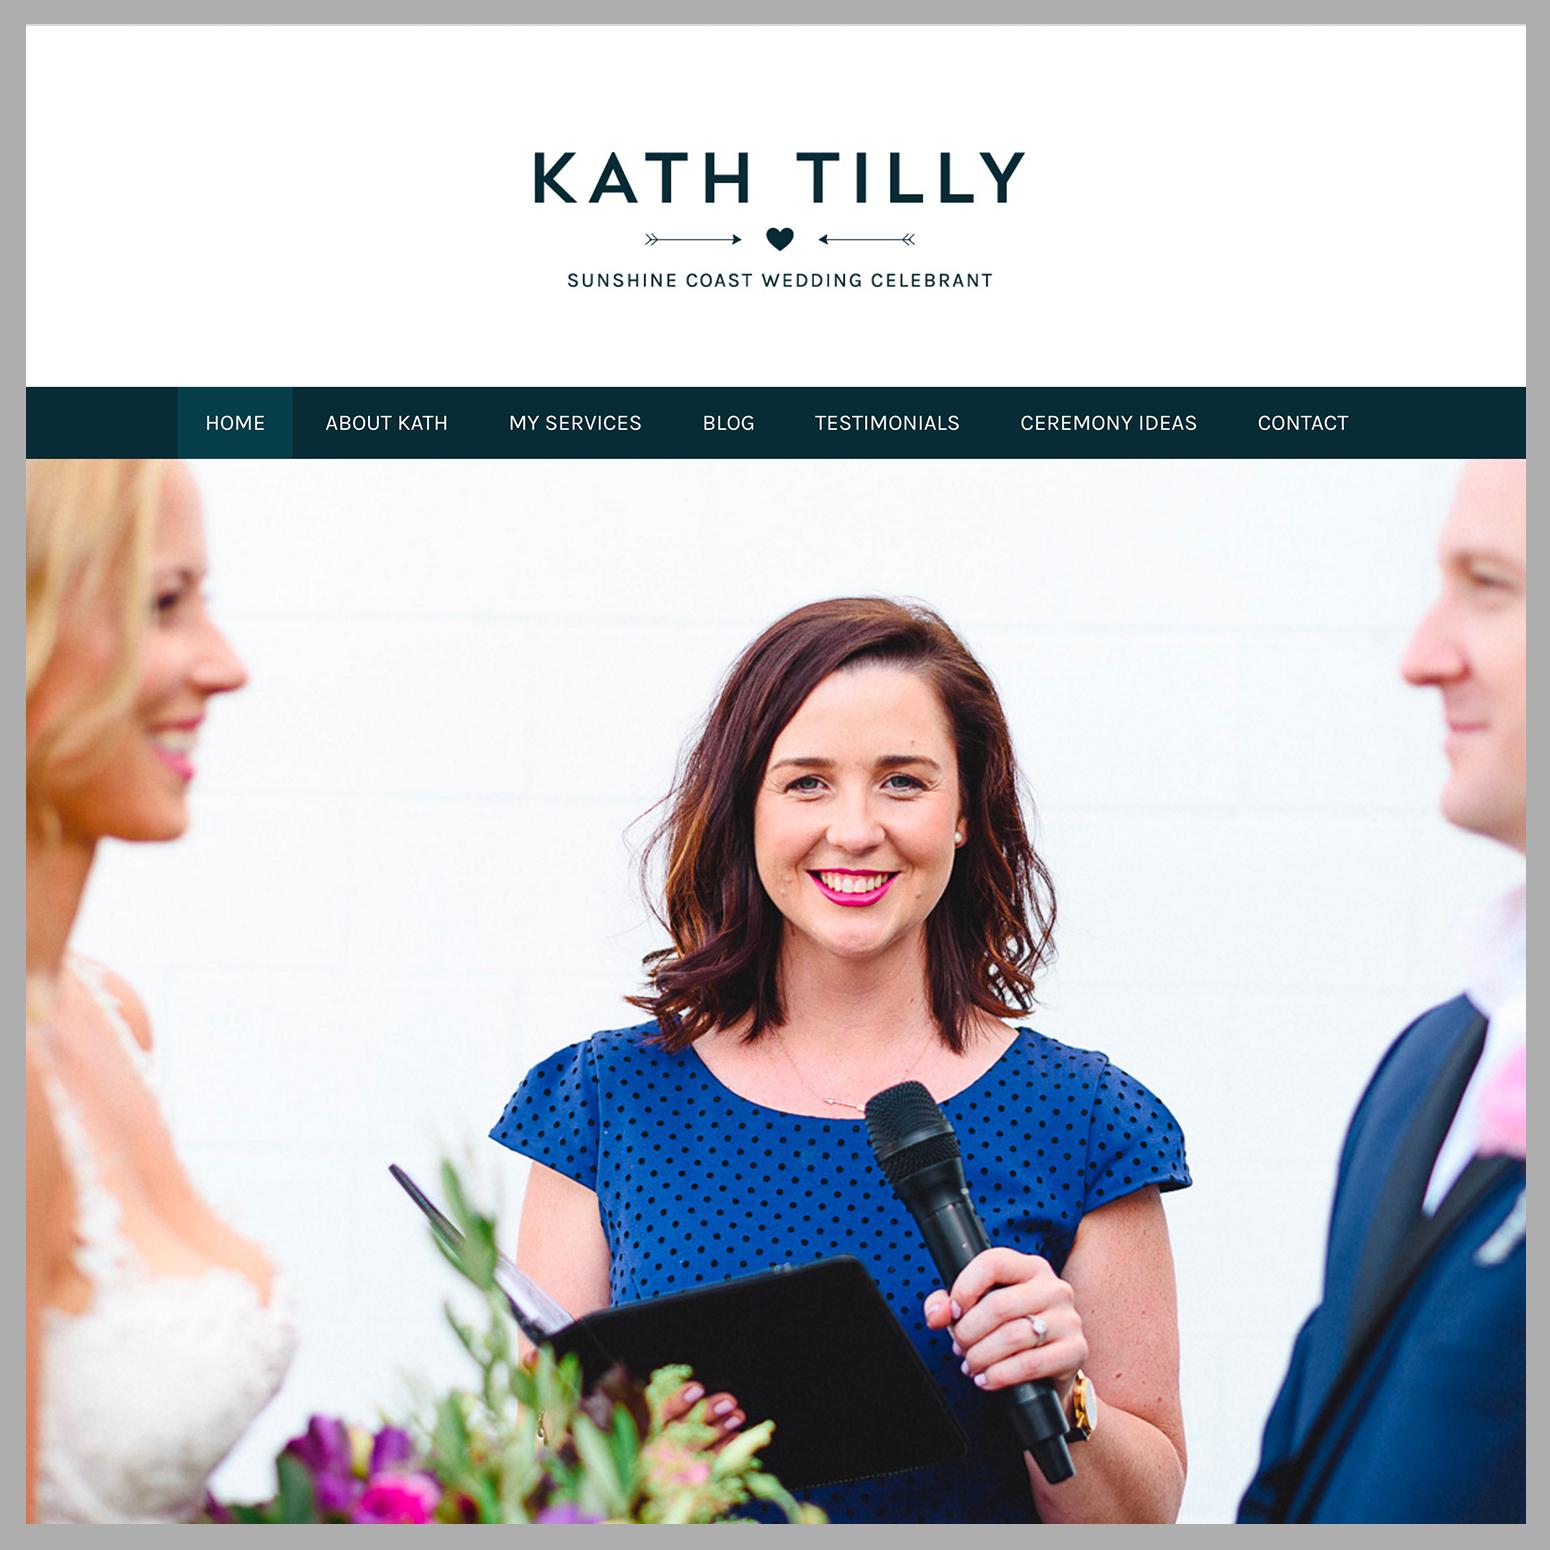 Kath Tilly Wedding Celebrant